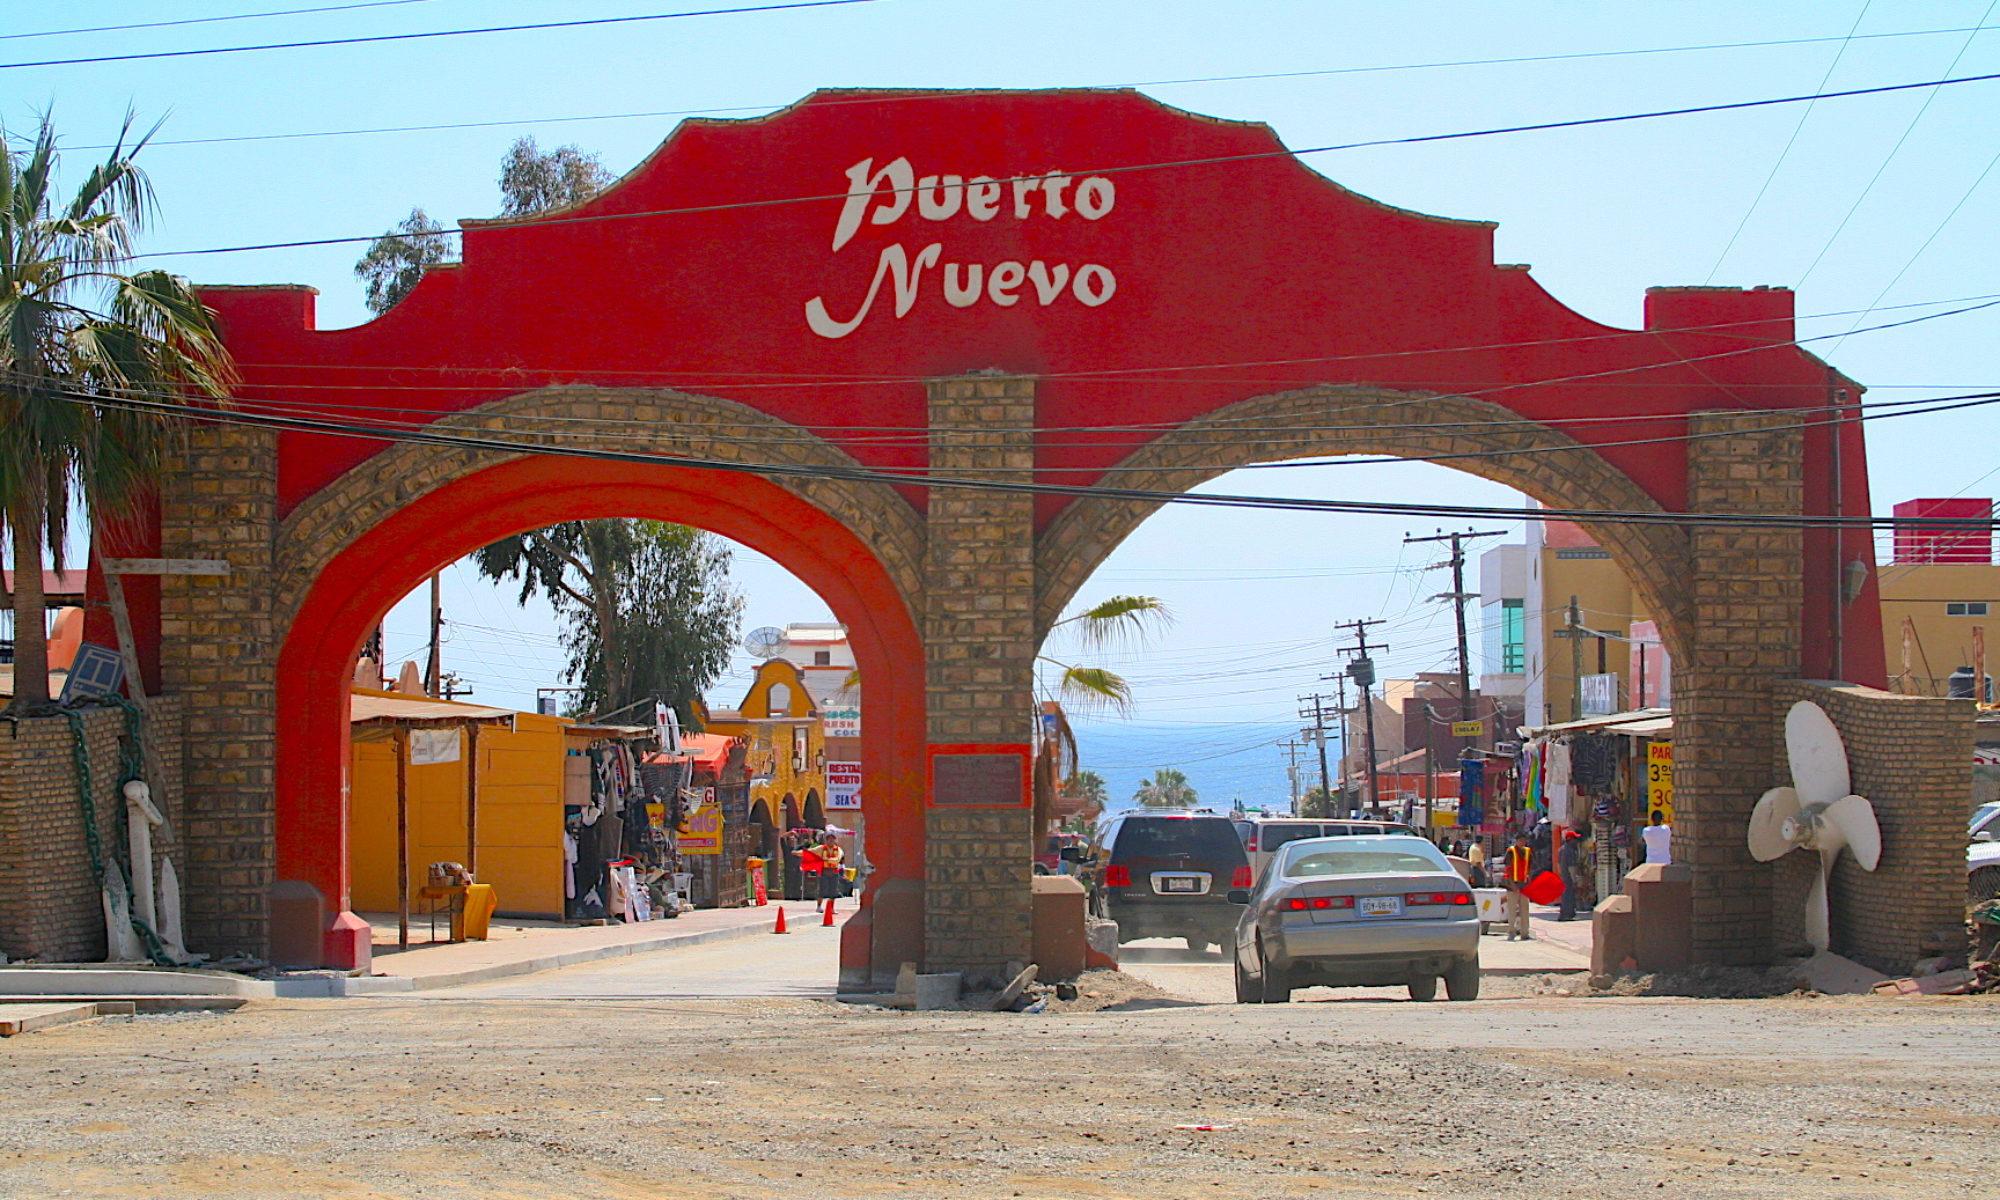 PuertoNuevo.com